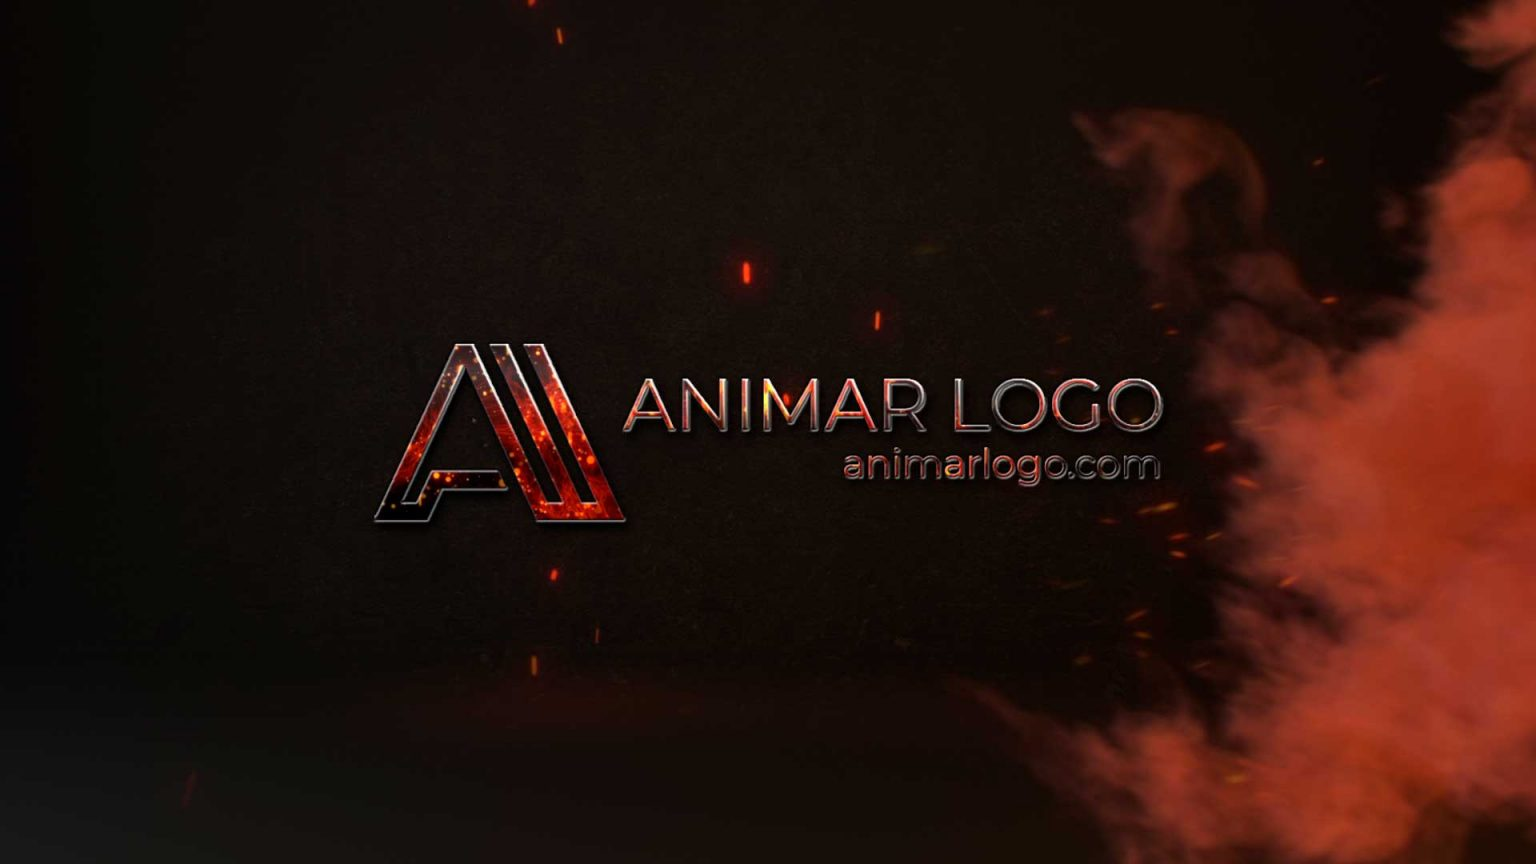 Logo-animado-Llamas-AL309-animacion-logotipo-1536x864